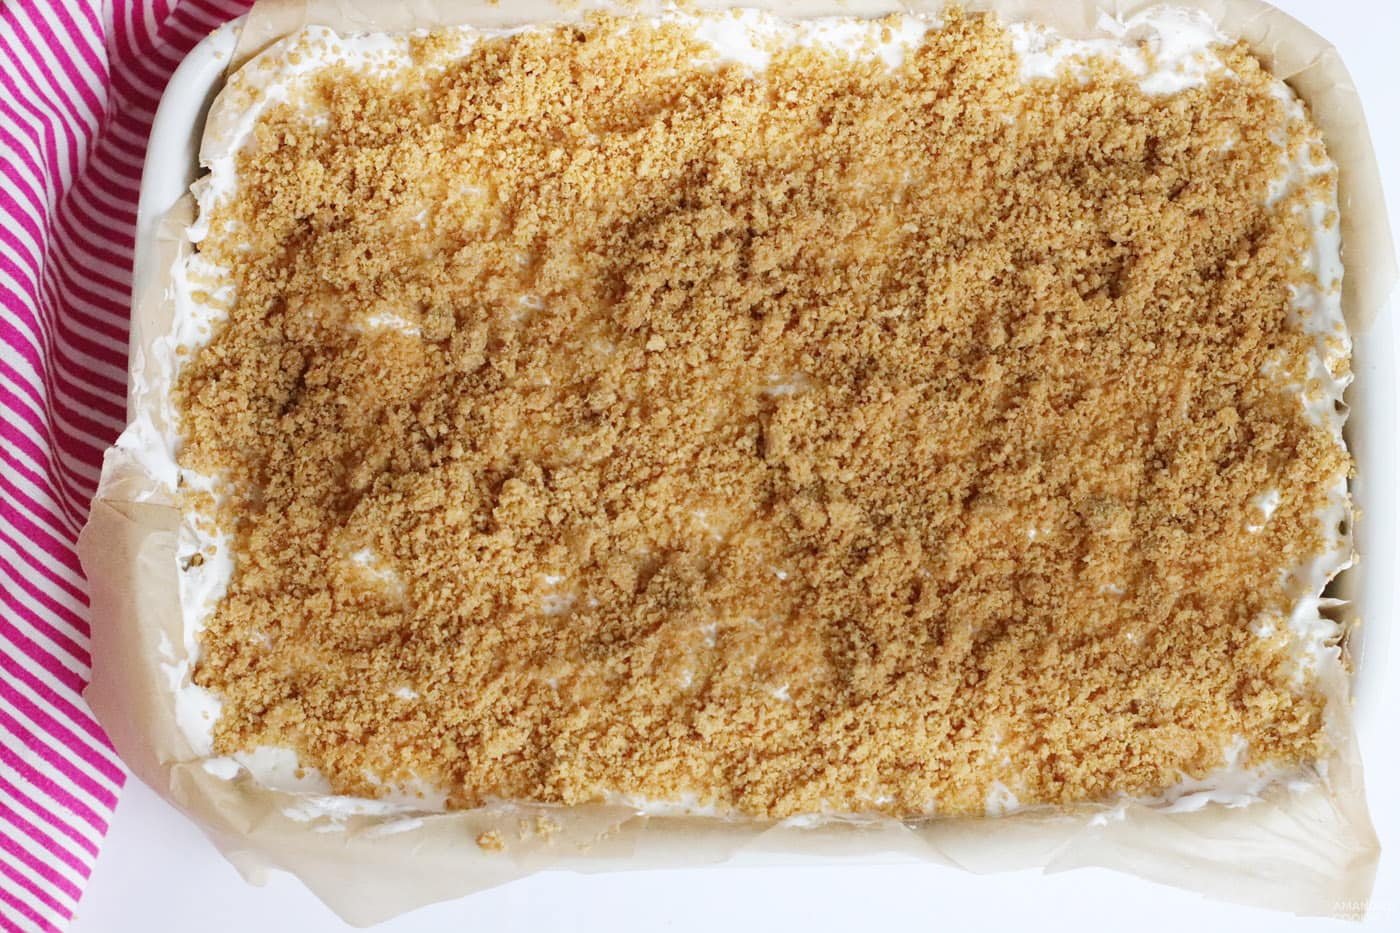 graham cracker topping on strawberry cheesecake bars